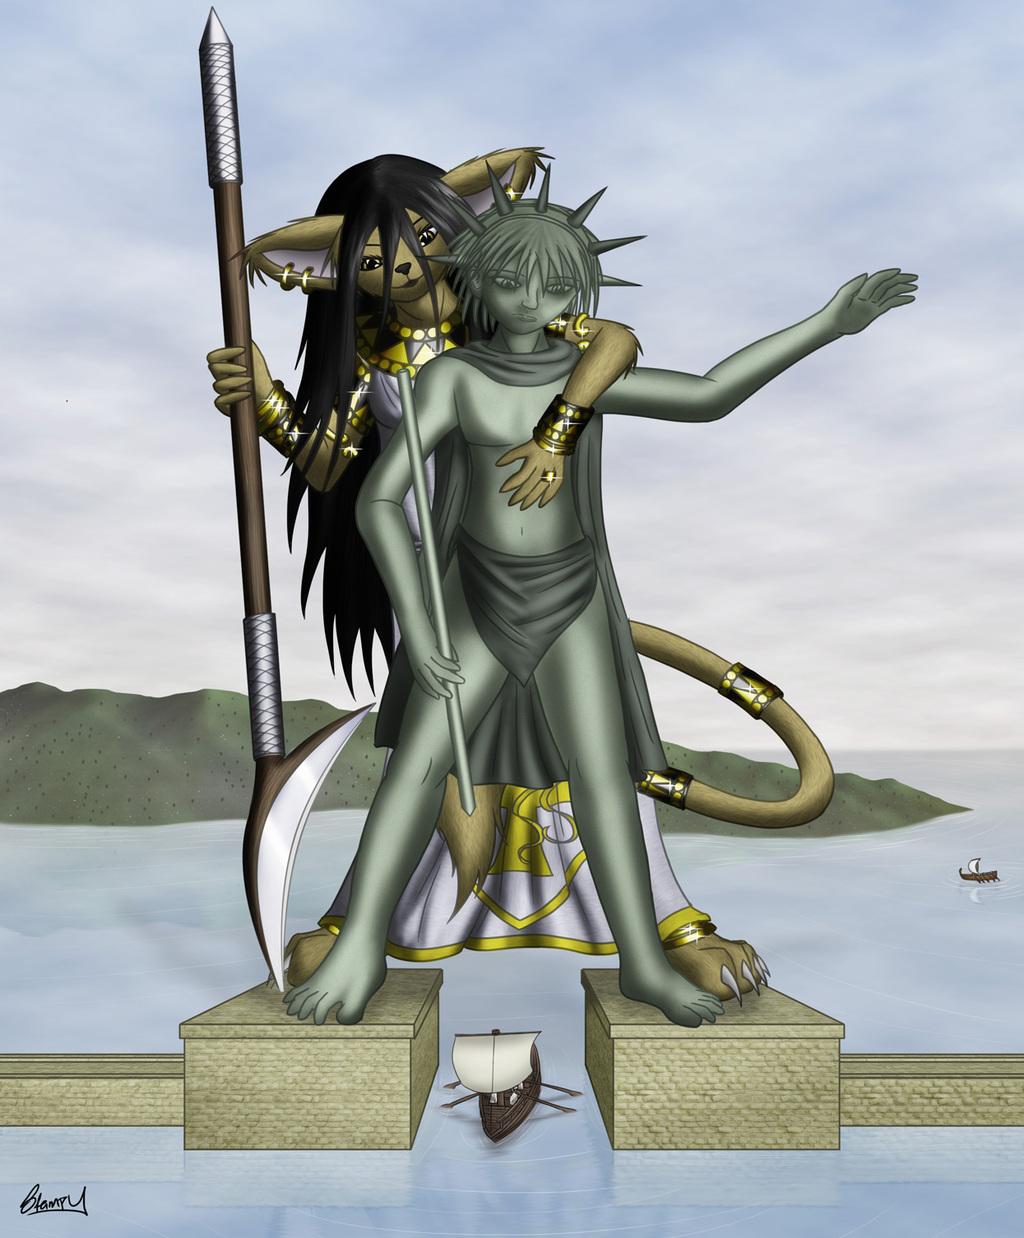 Kiya's Wonders VI - Colossus of Rhodes